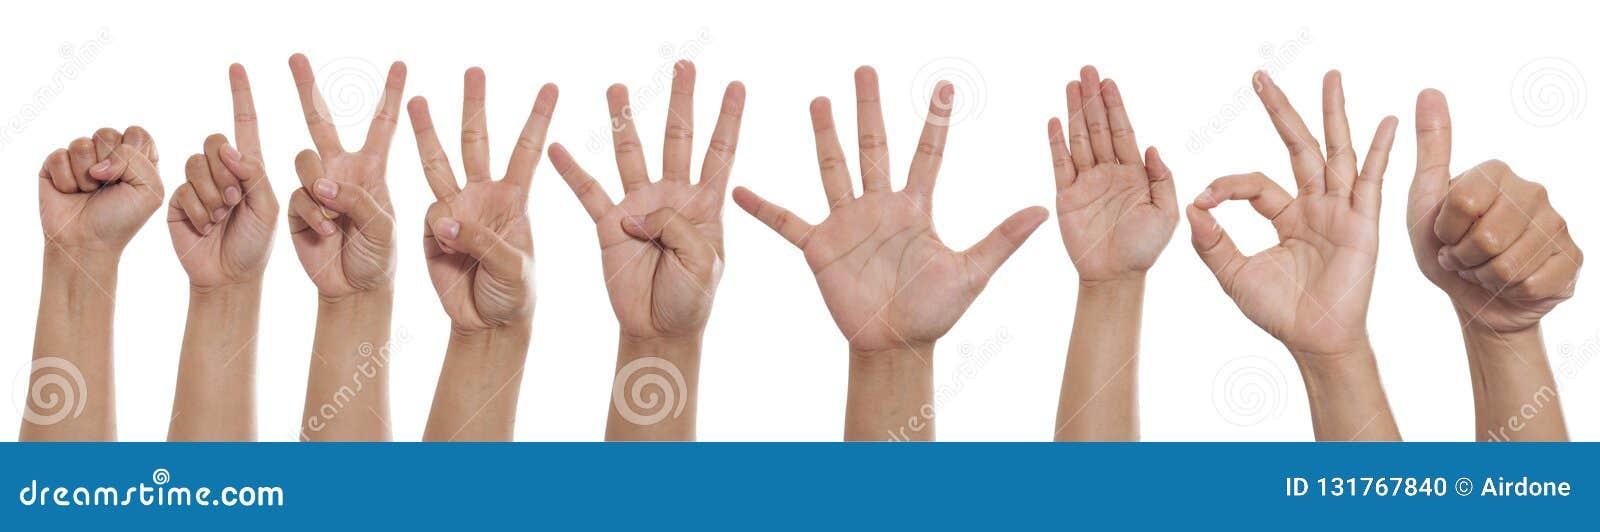 Collage of hands showing different gestures, number hand finger signs set